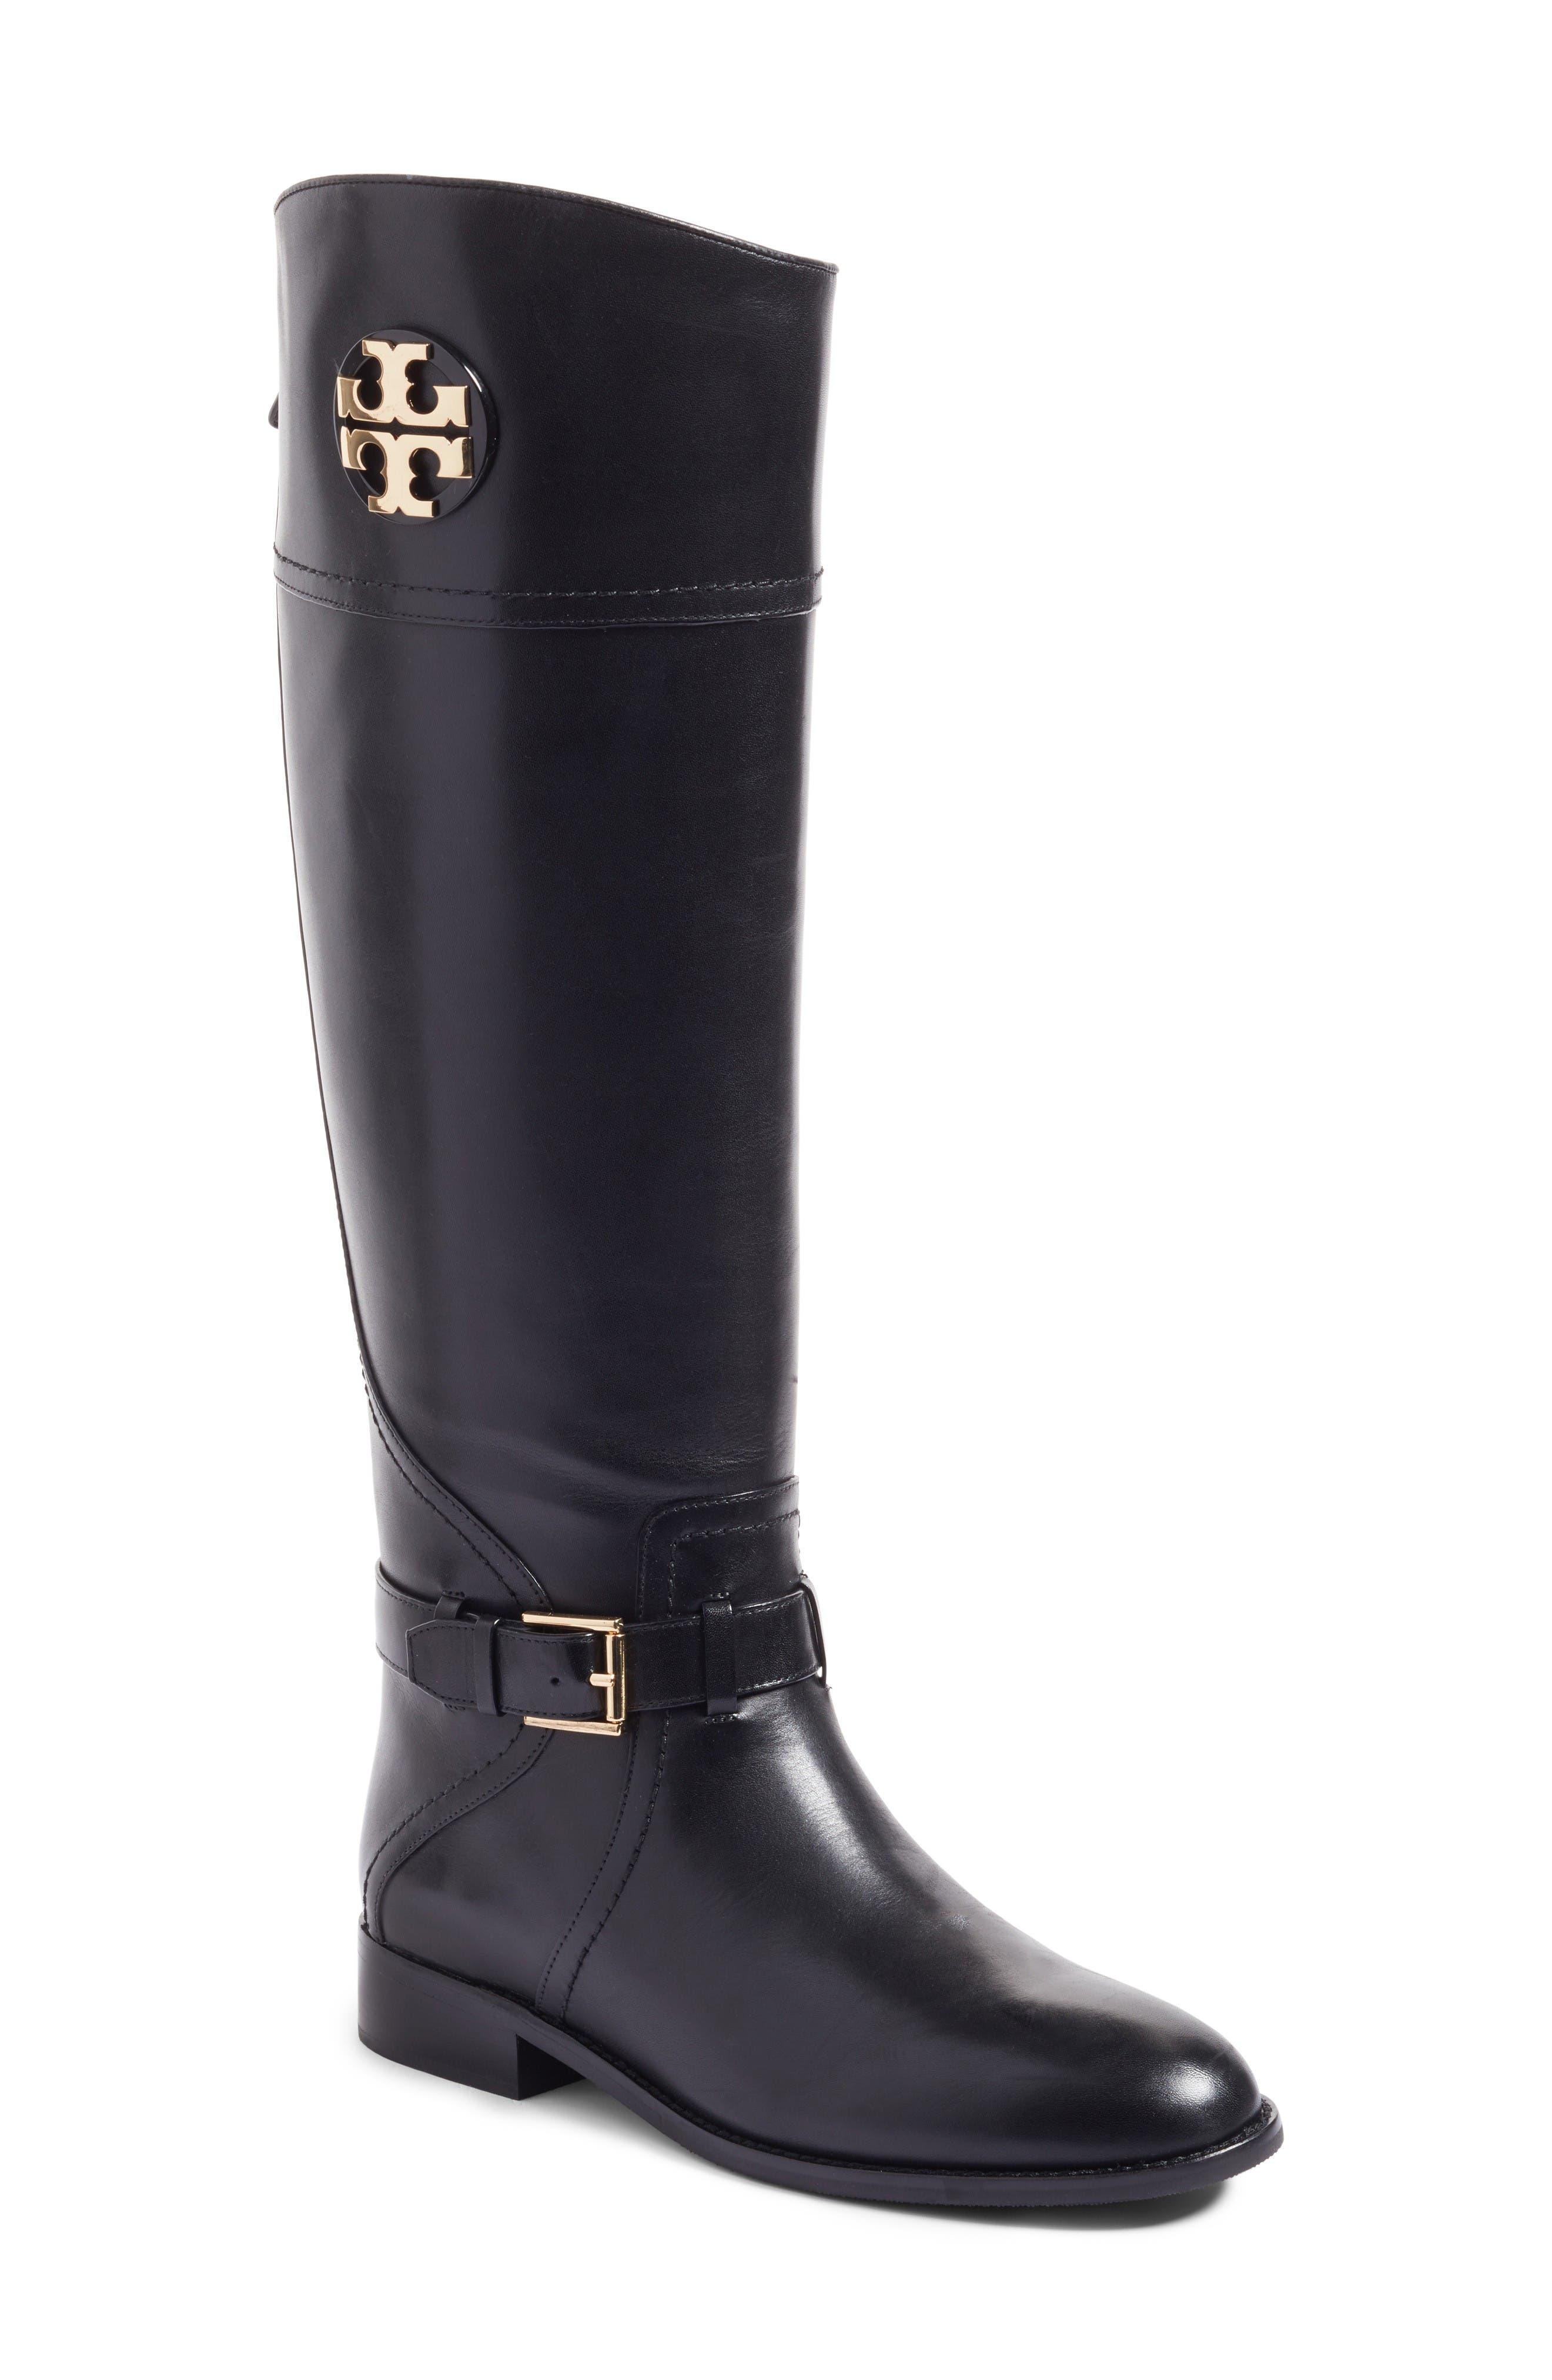 Main Image - Tory Burch Adeline Boot (Women) (Regular & Wide Calf)